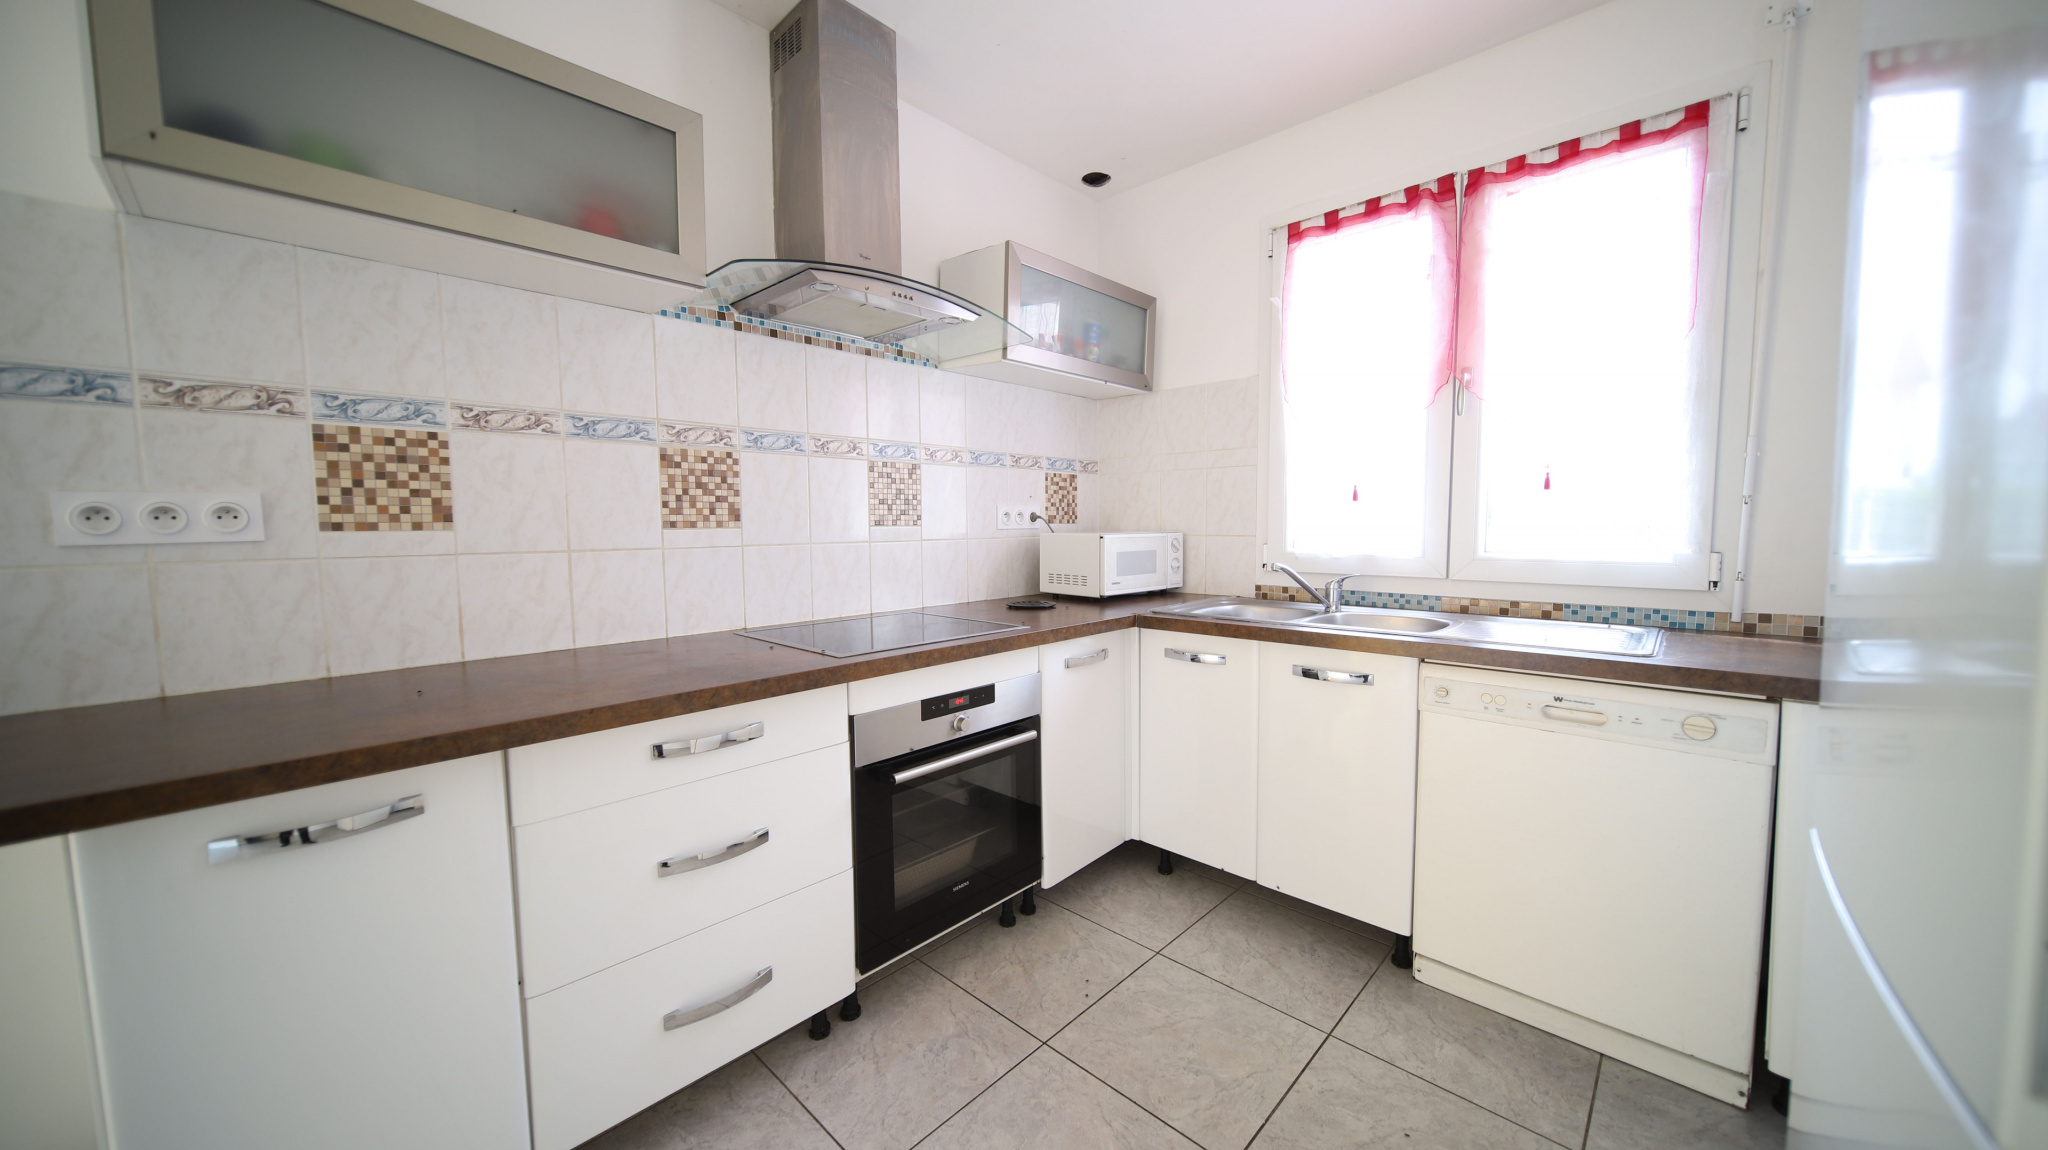 maison/villa à vendre ramonchamp